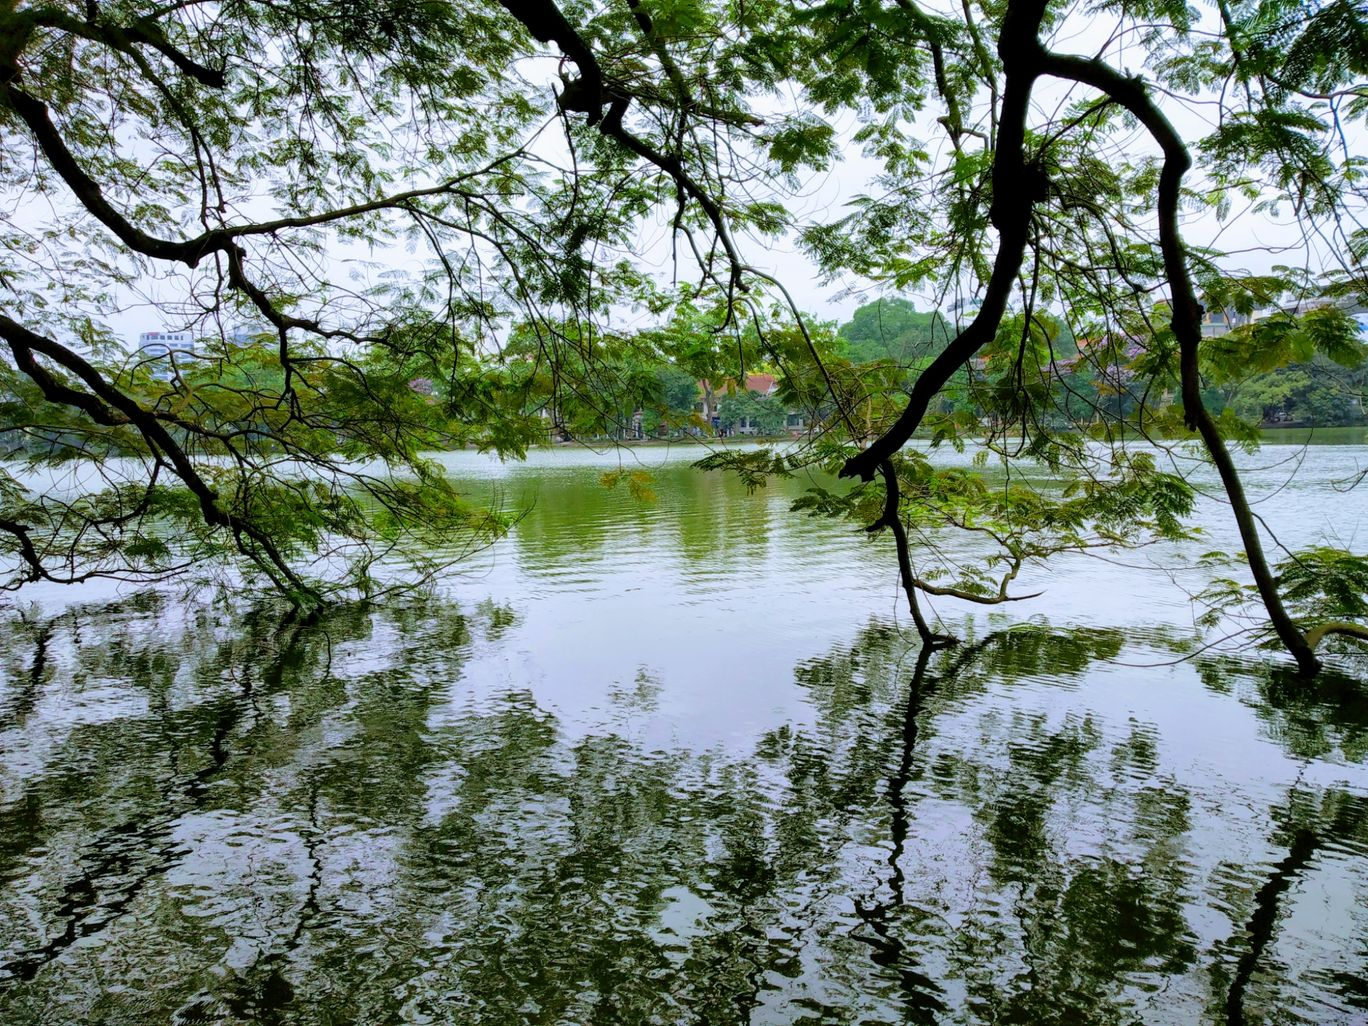 Photo of Hoàn Kiếm Lake By earth.nature.lovers